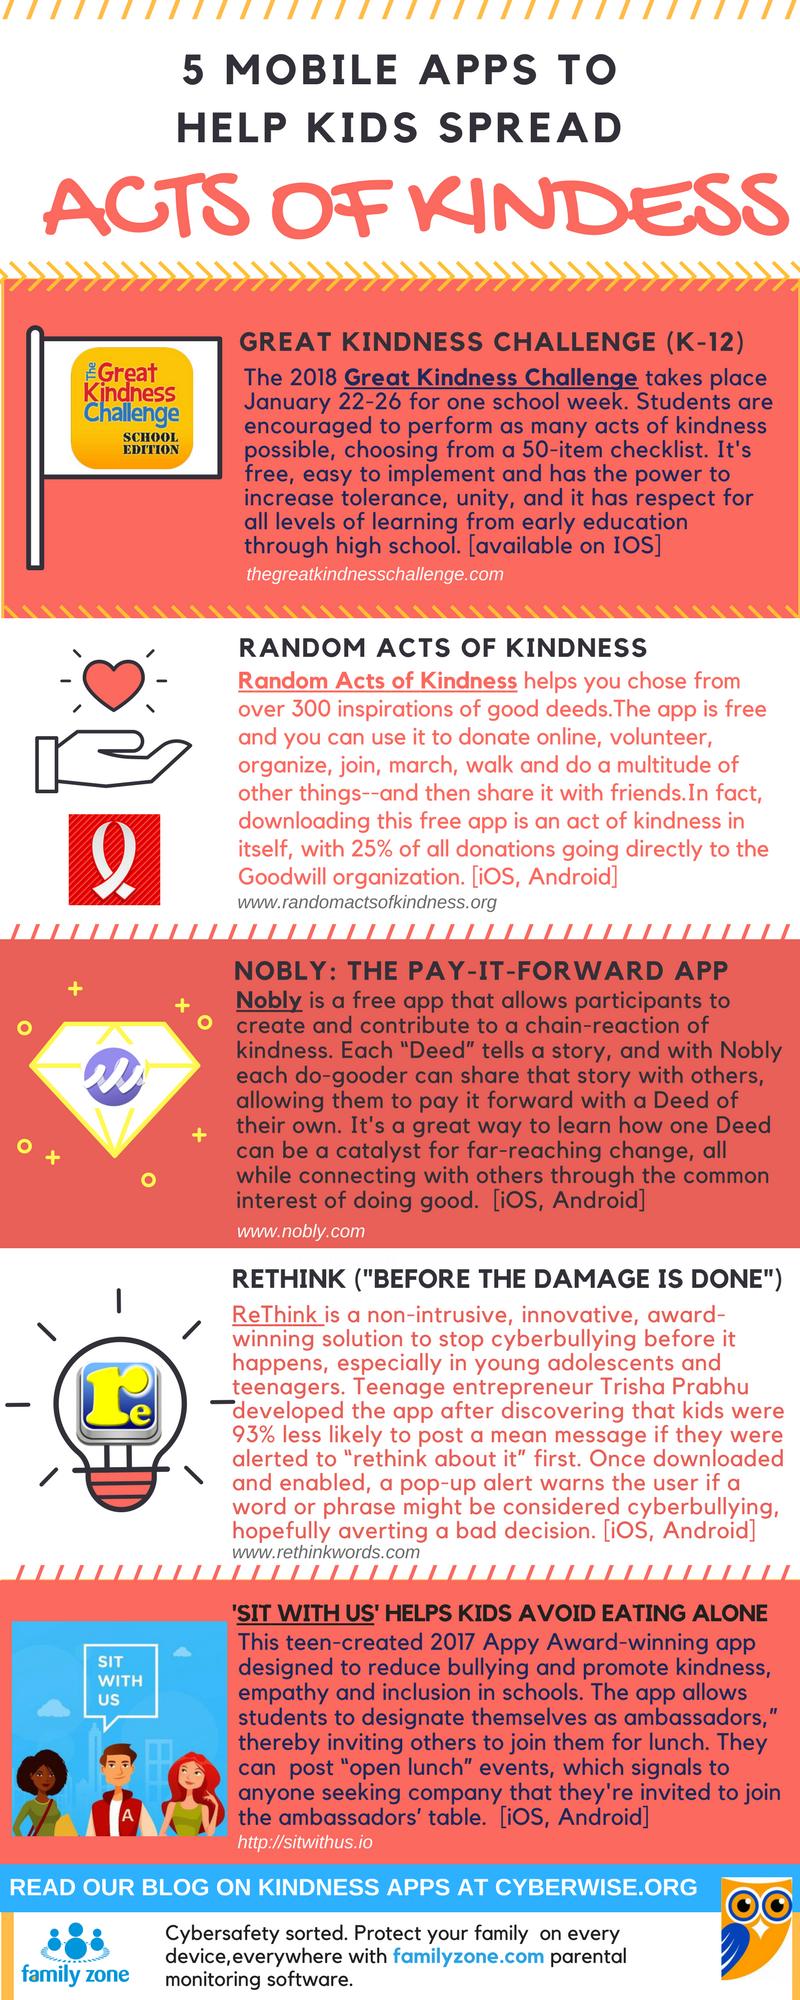 5 Kindness Apps